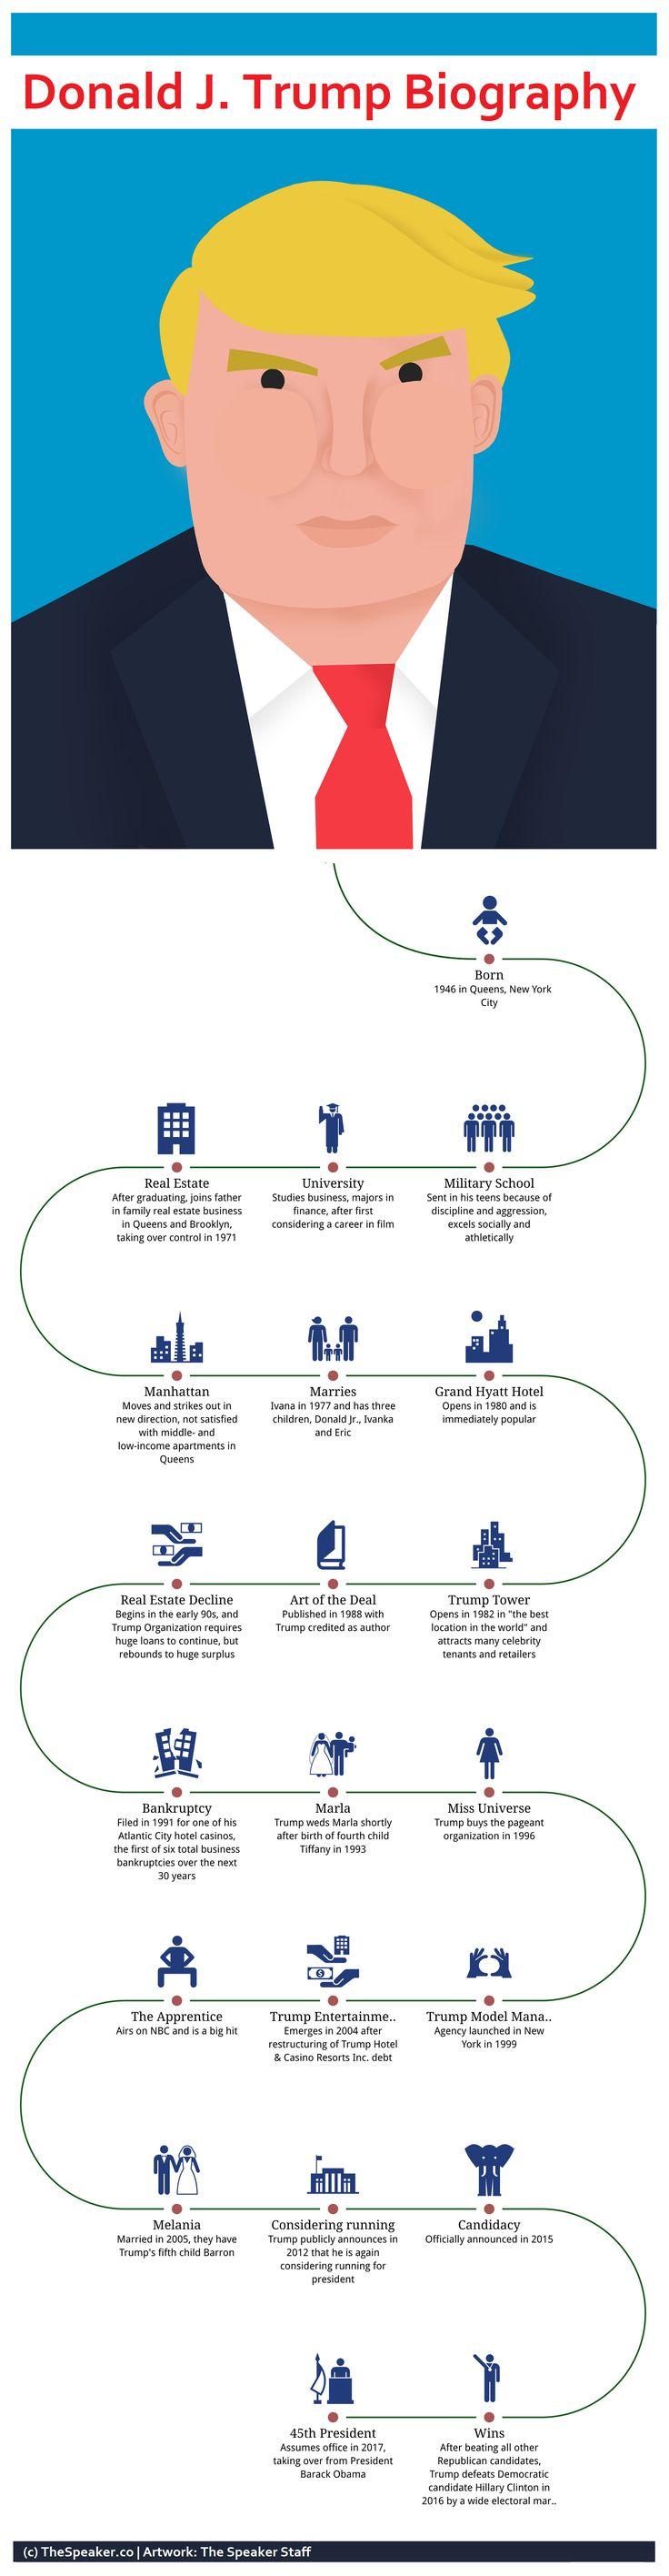 Donald Trump Biography Infographic